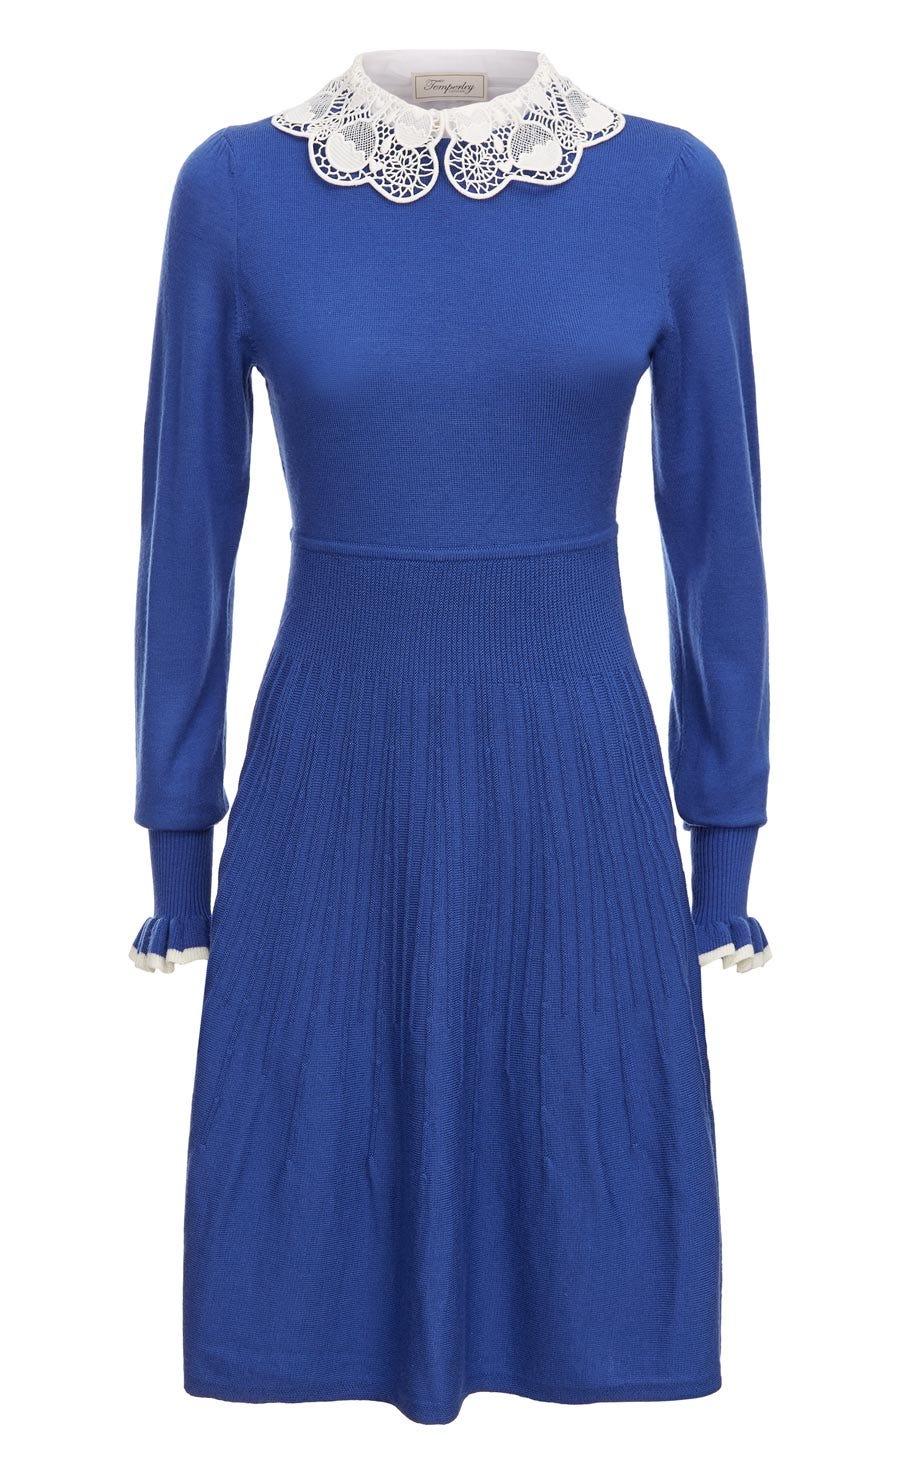 Bliss Sleeved Dress, French Blue